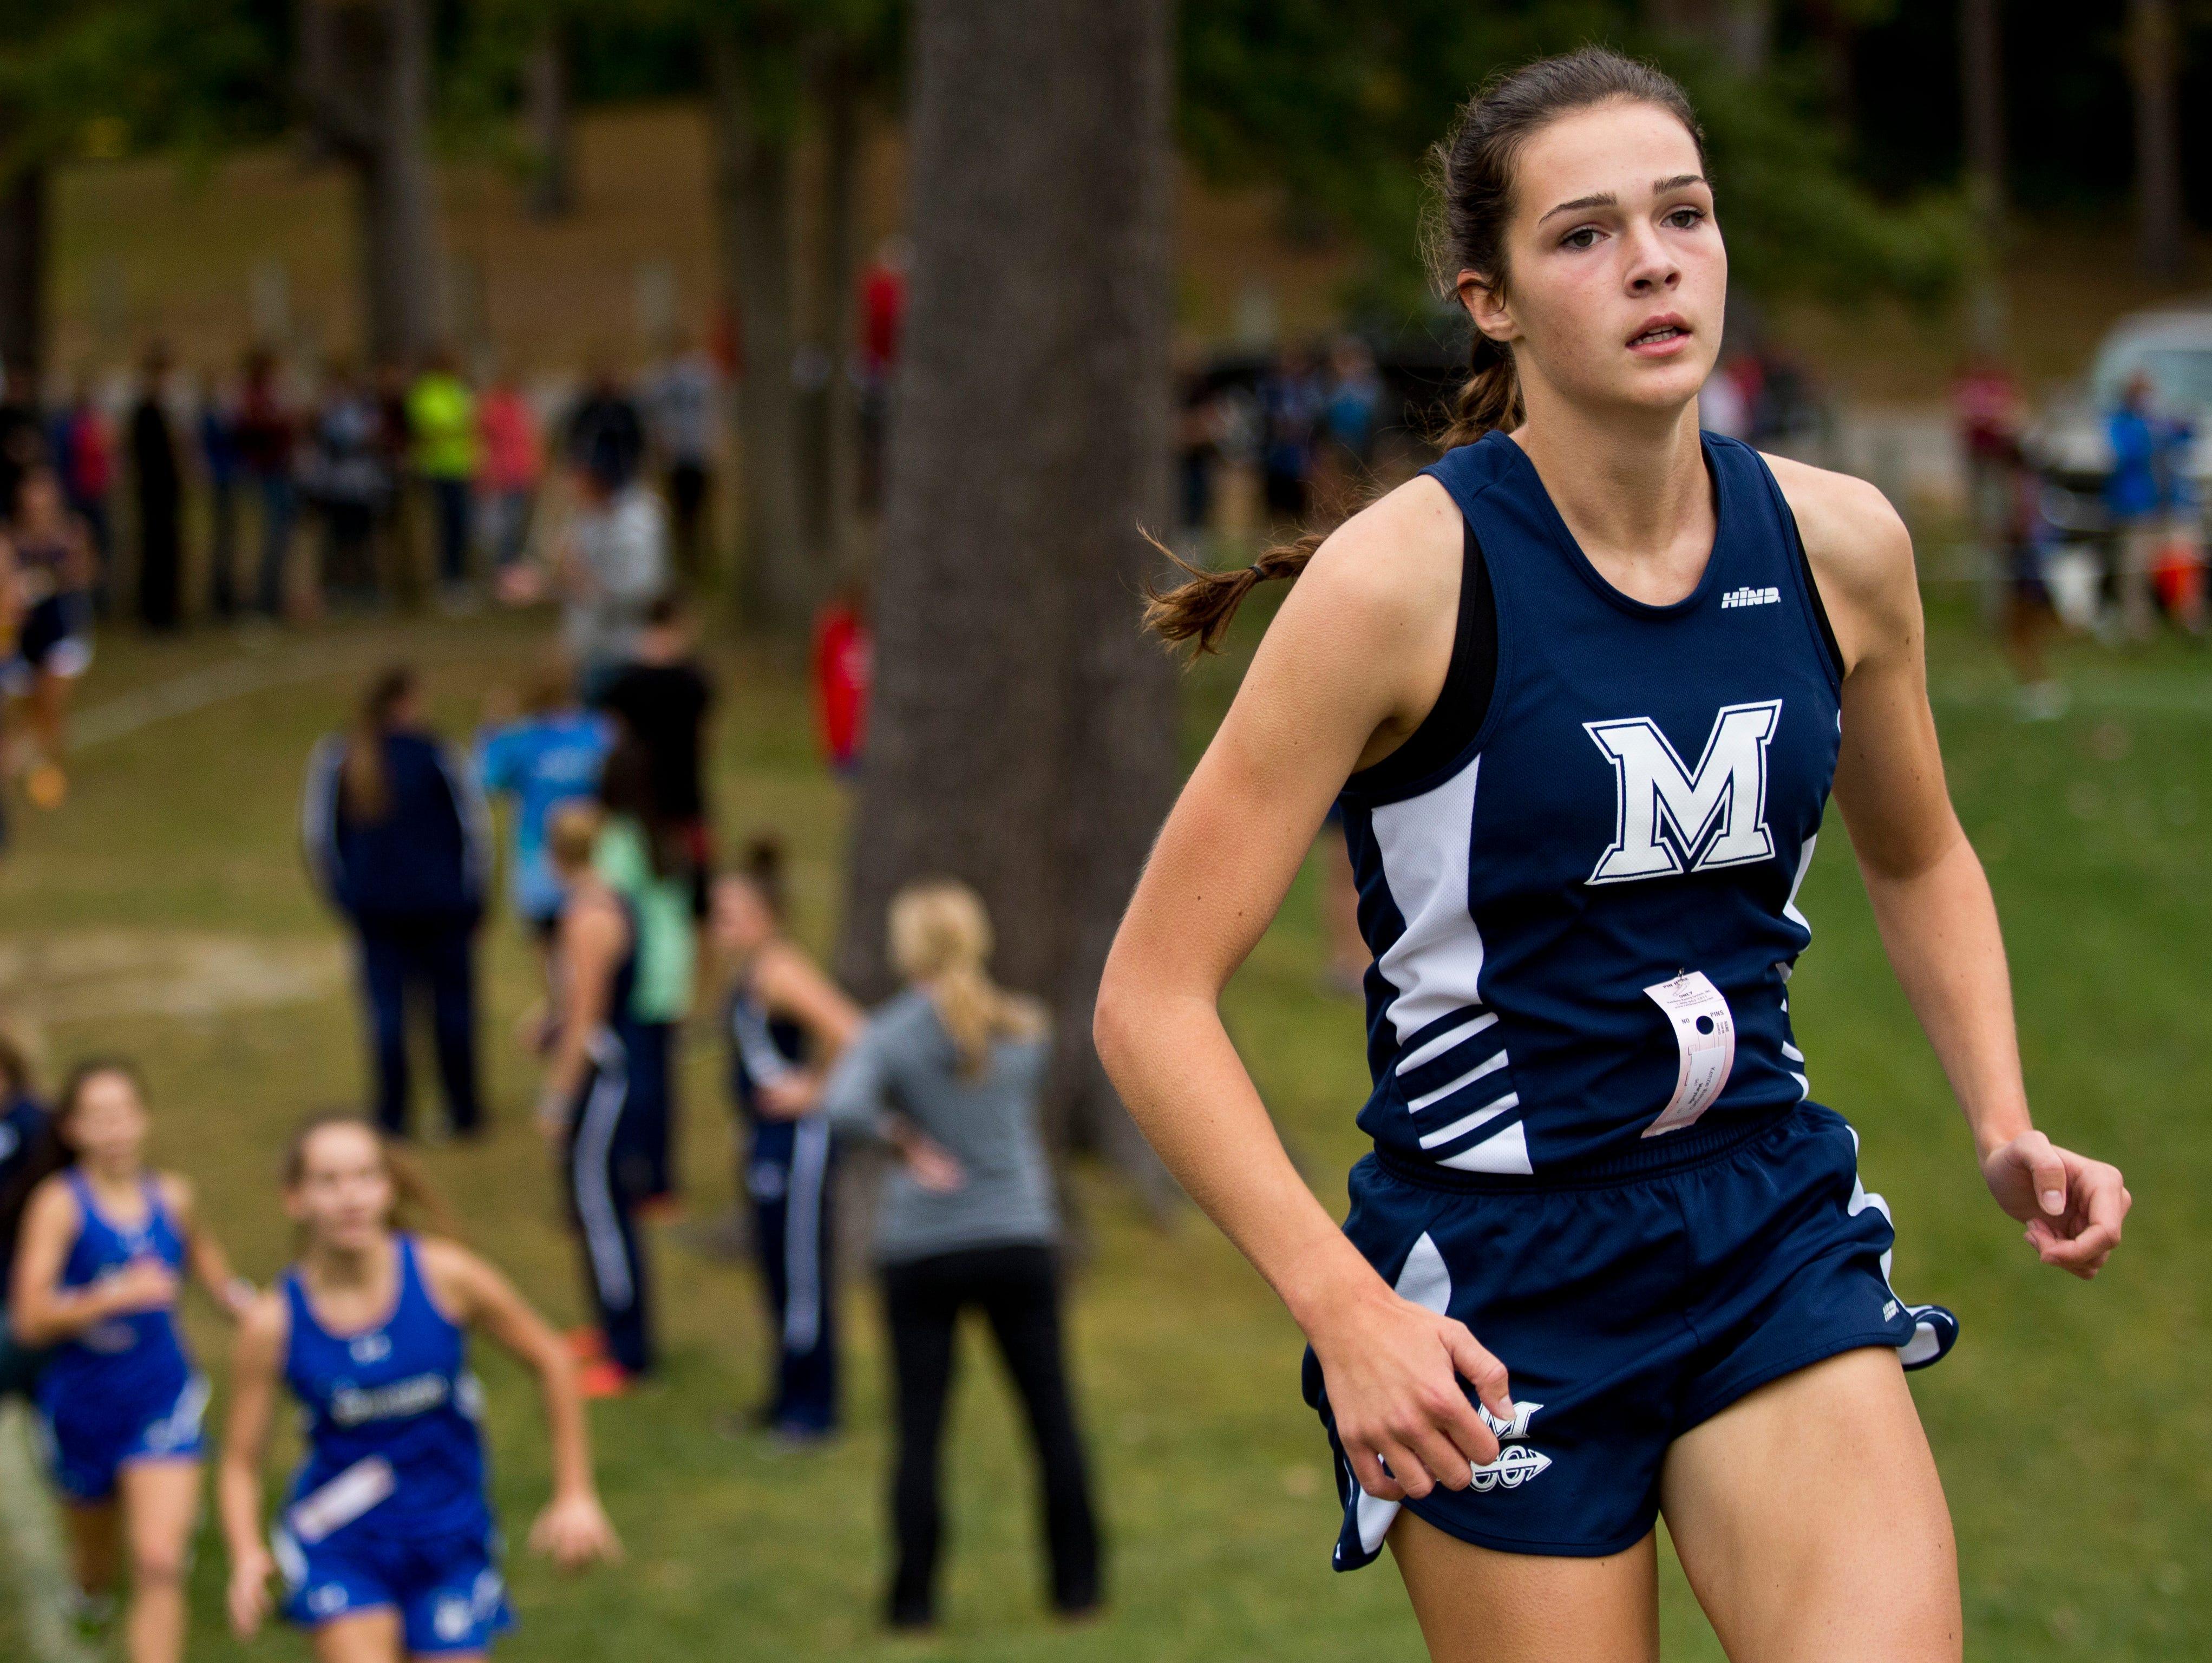 Marysville's Kenzie Weingartz runs during the Marysville Invitational cross country meet Thursday, October 8, 2015 at Marysville City Park.